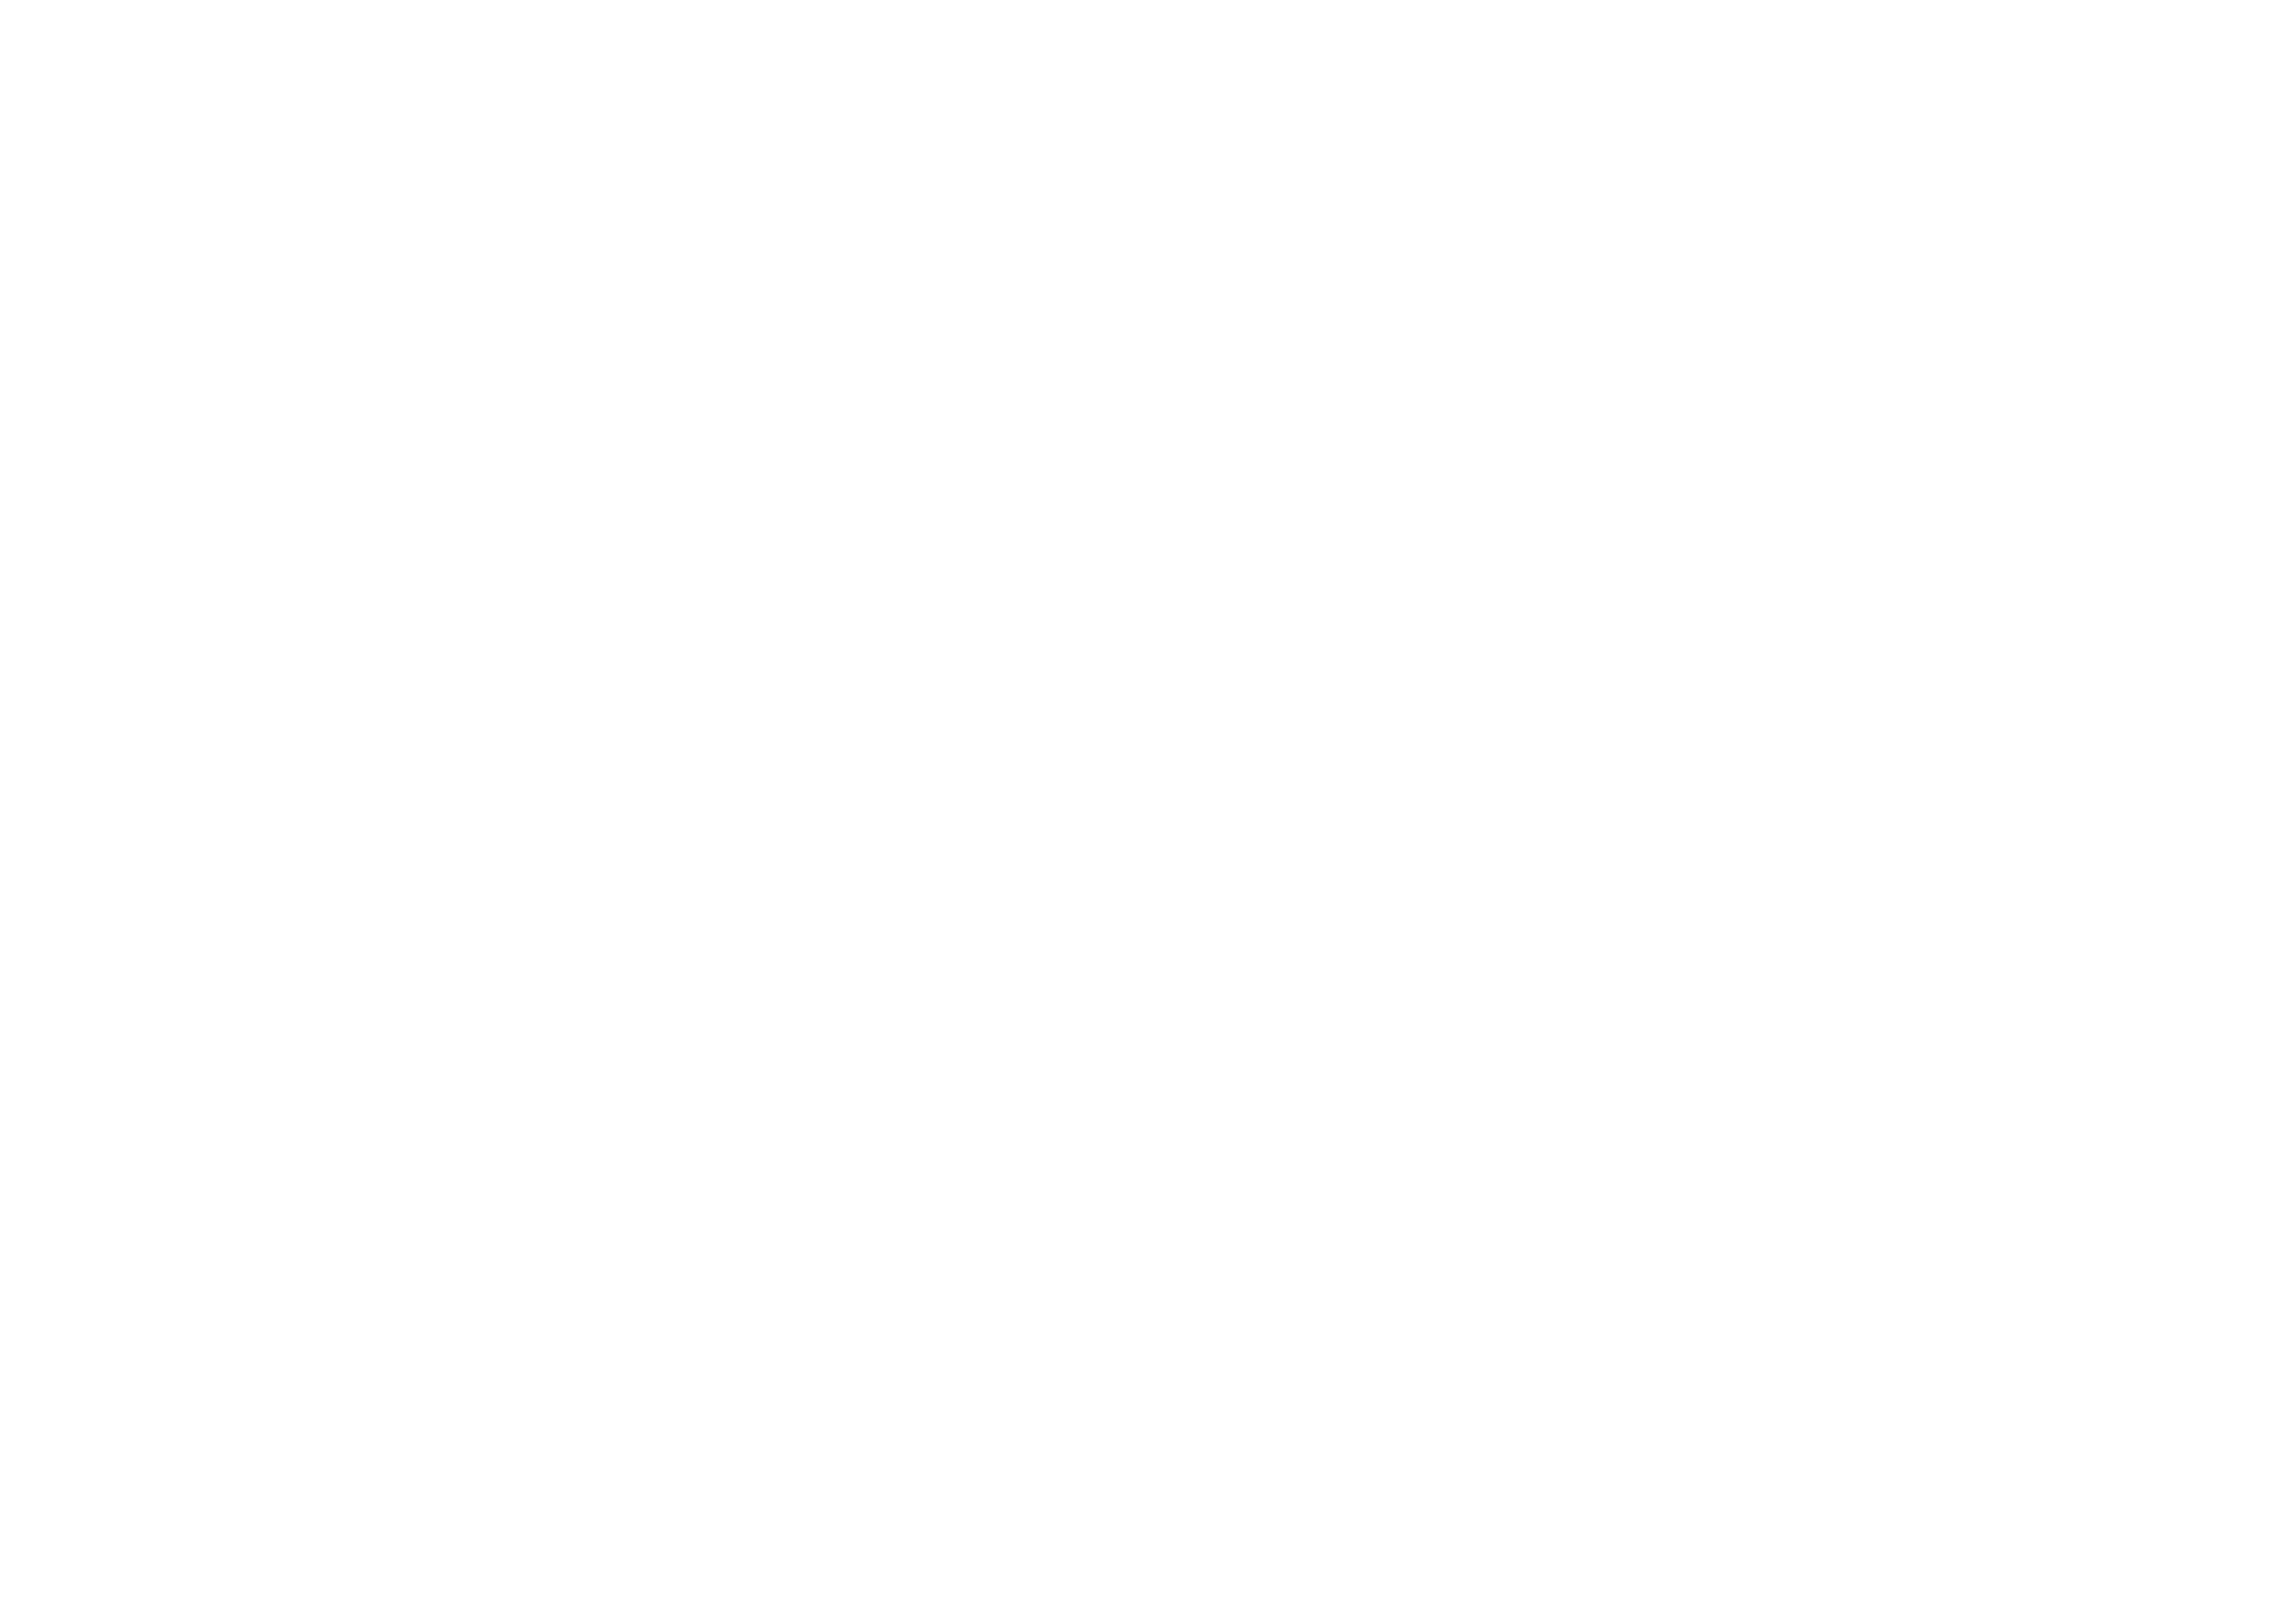 KPMG Private Enterprise